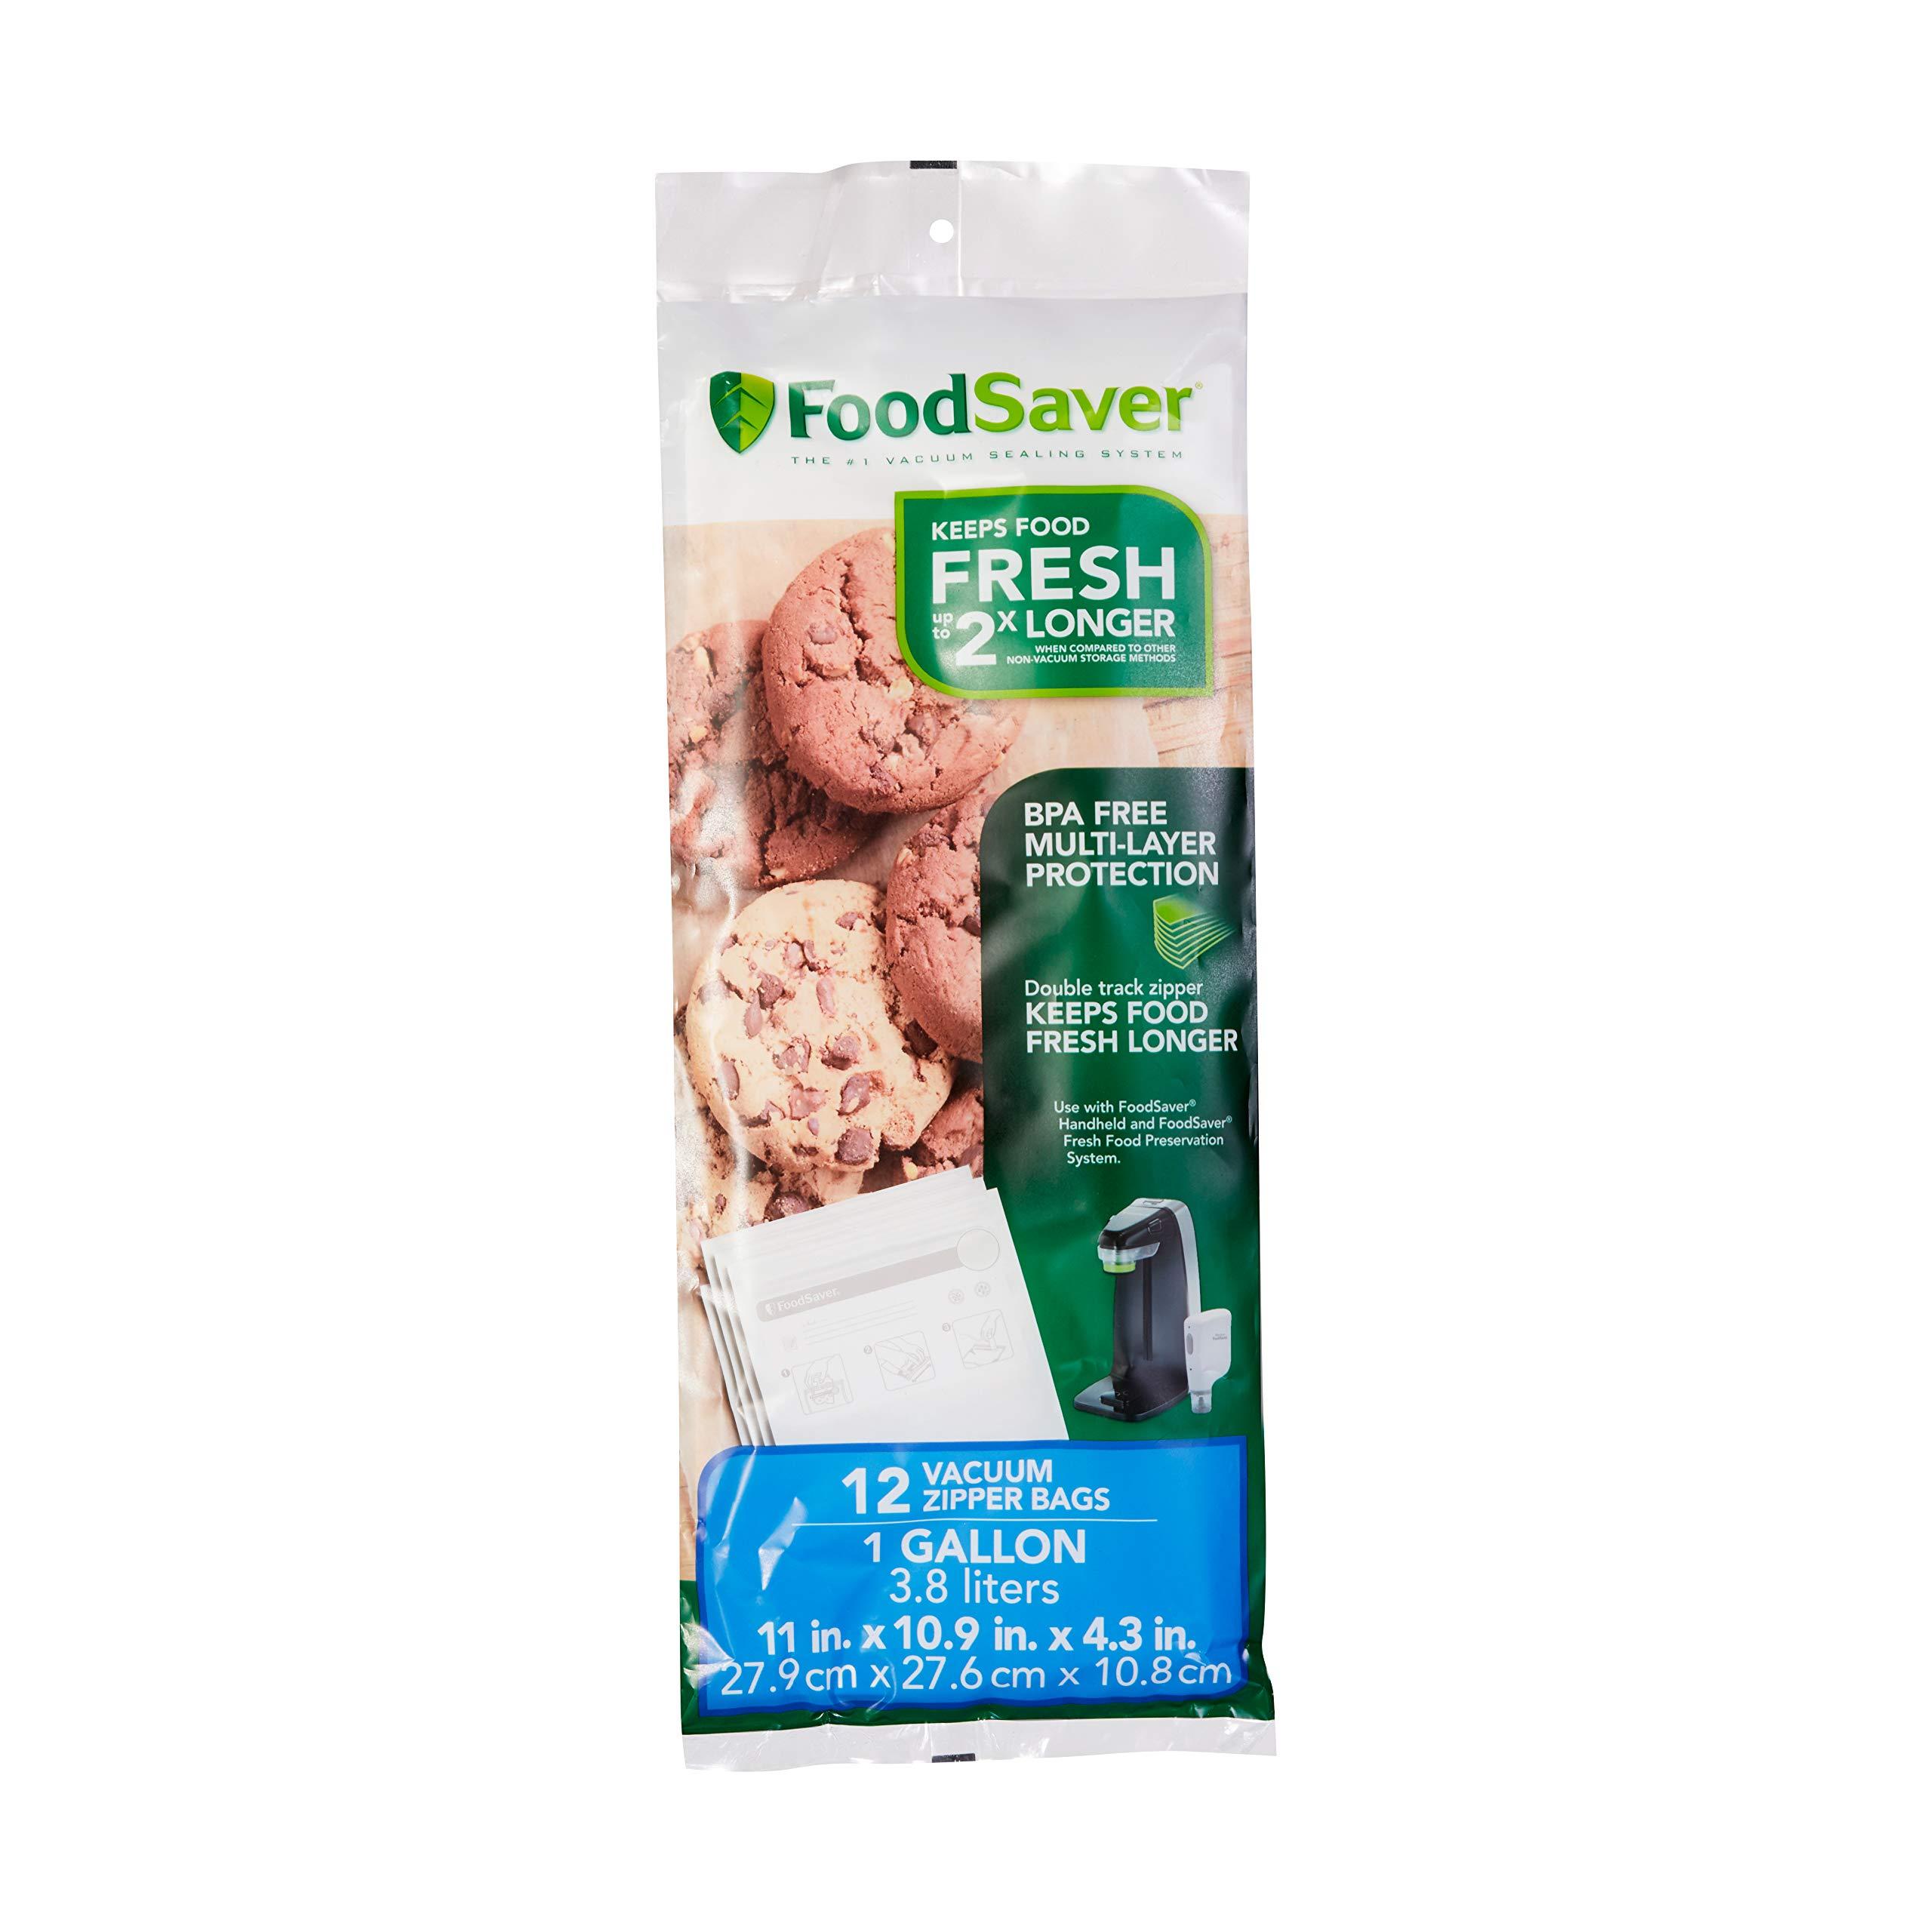 FoodSaver FSFRBZ0316-000 1-Gallon Vacuum Zipper Bags, 12 Count, Multi by FoodSaver